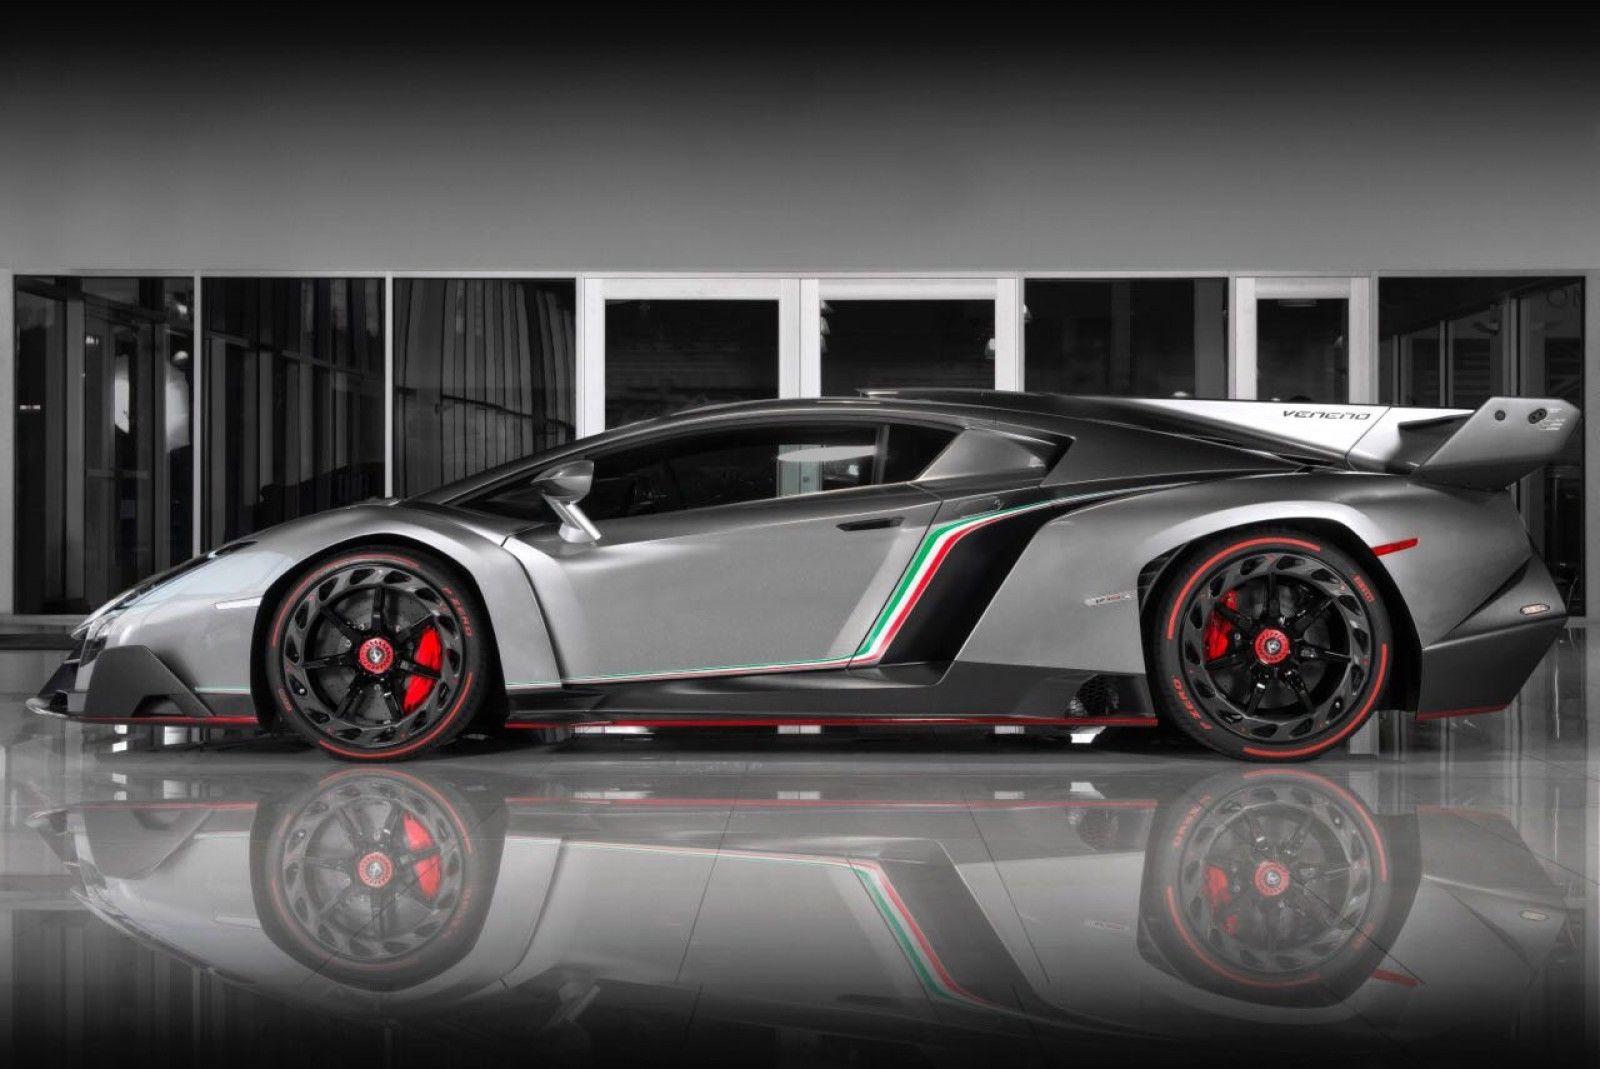 Lamborghini Veneno owner